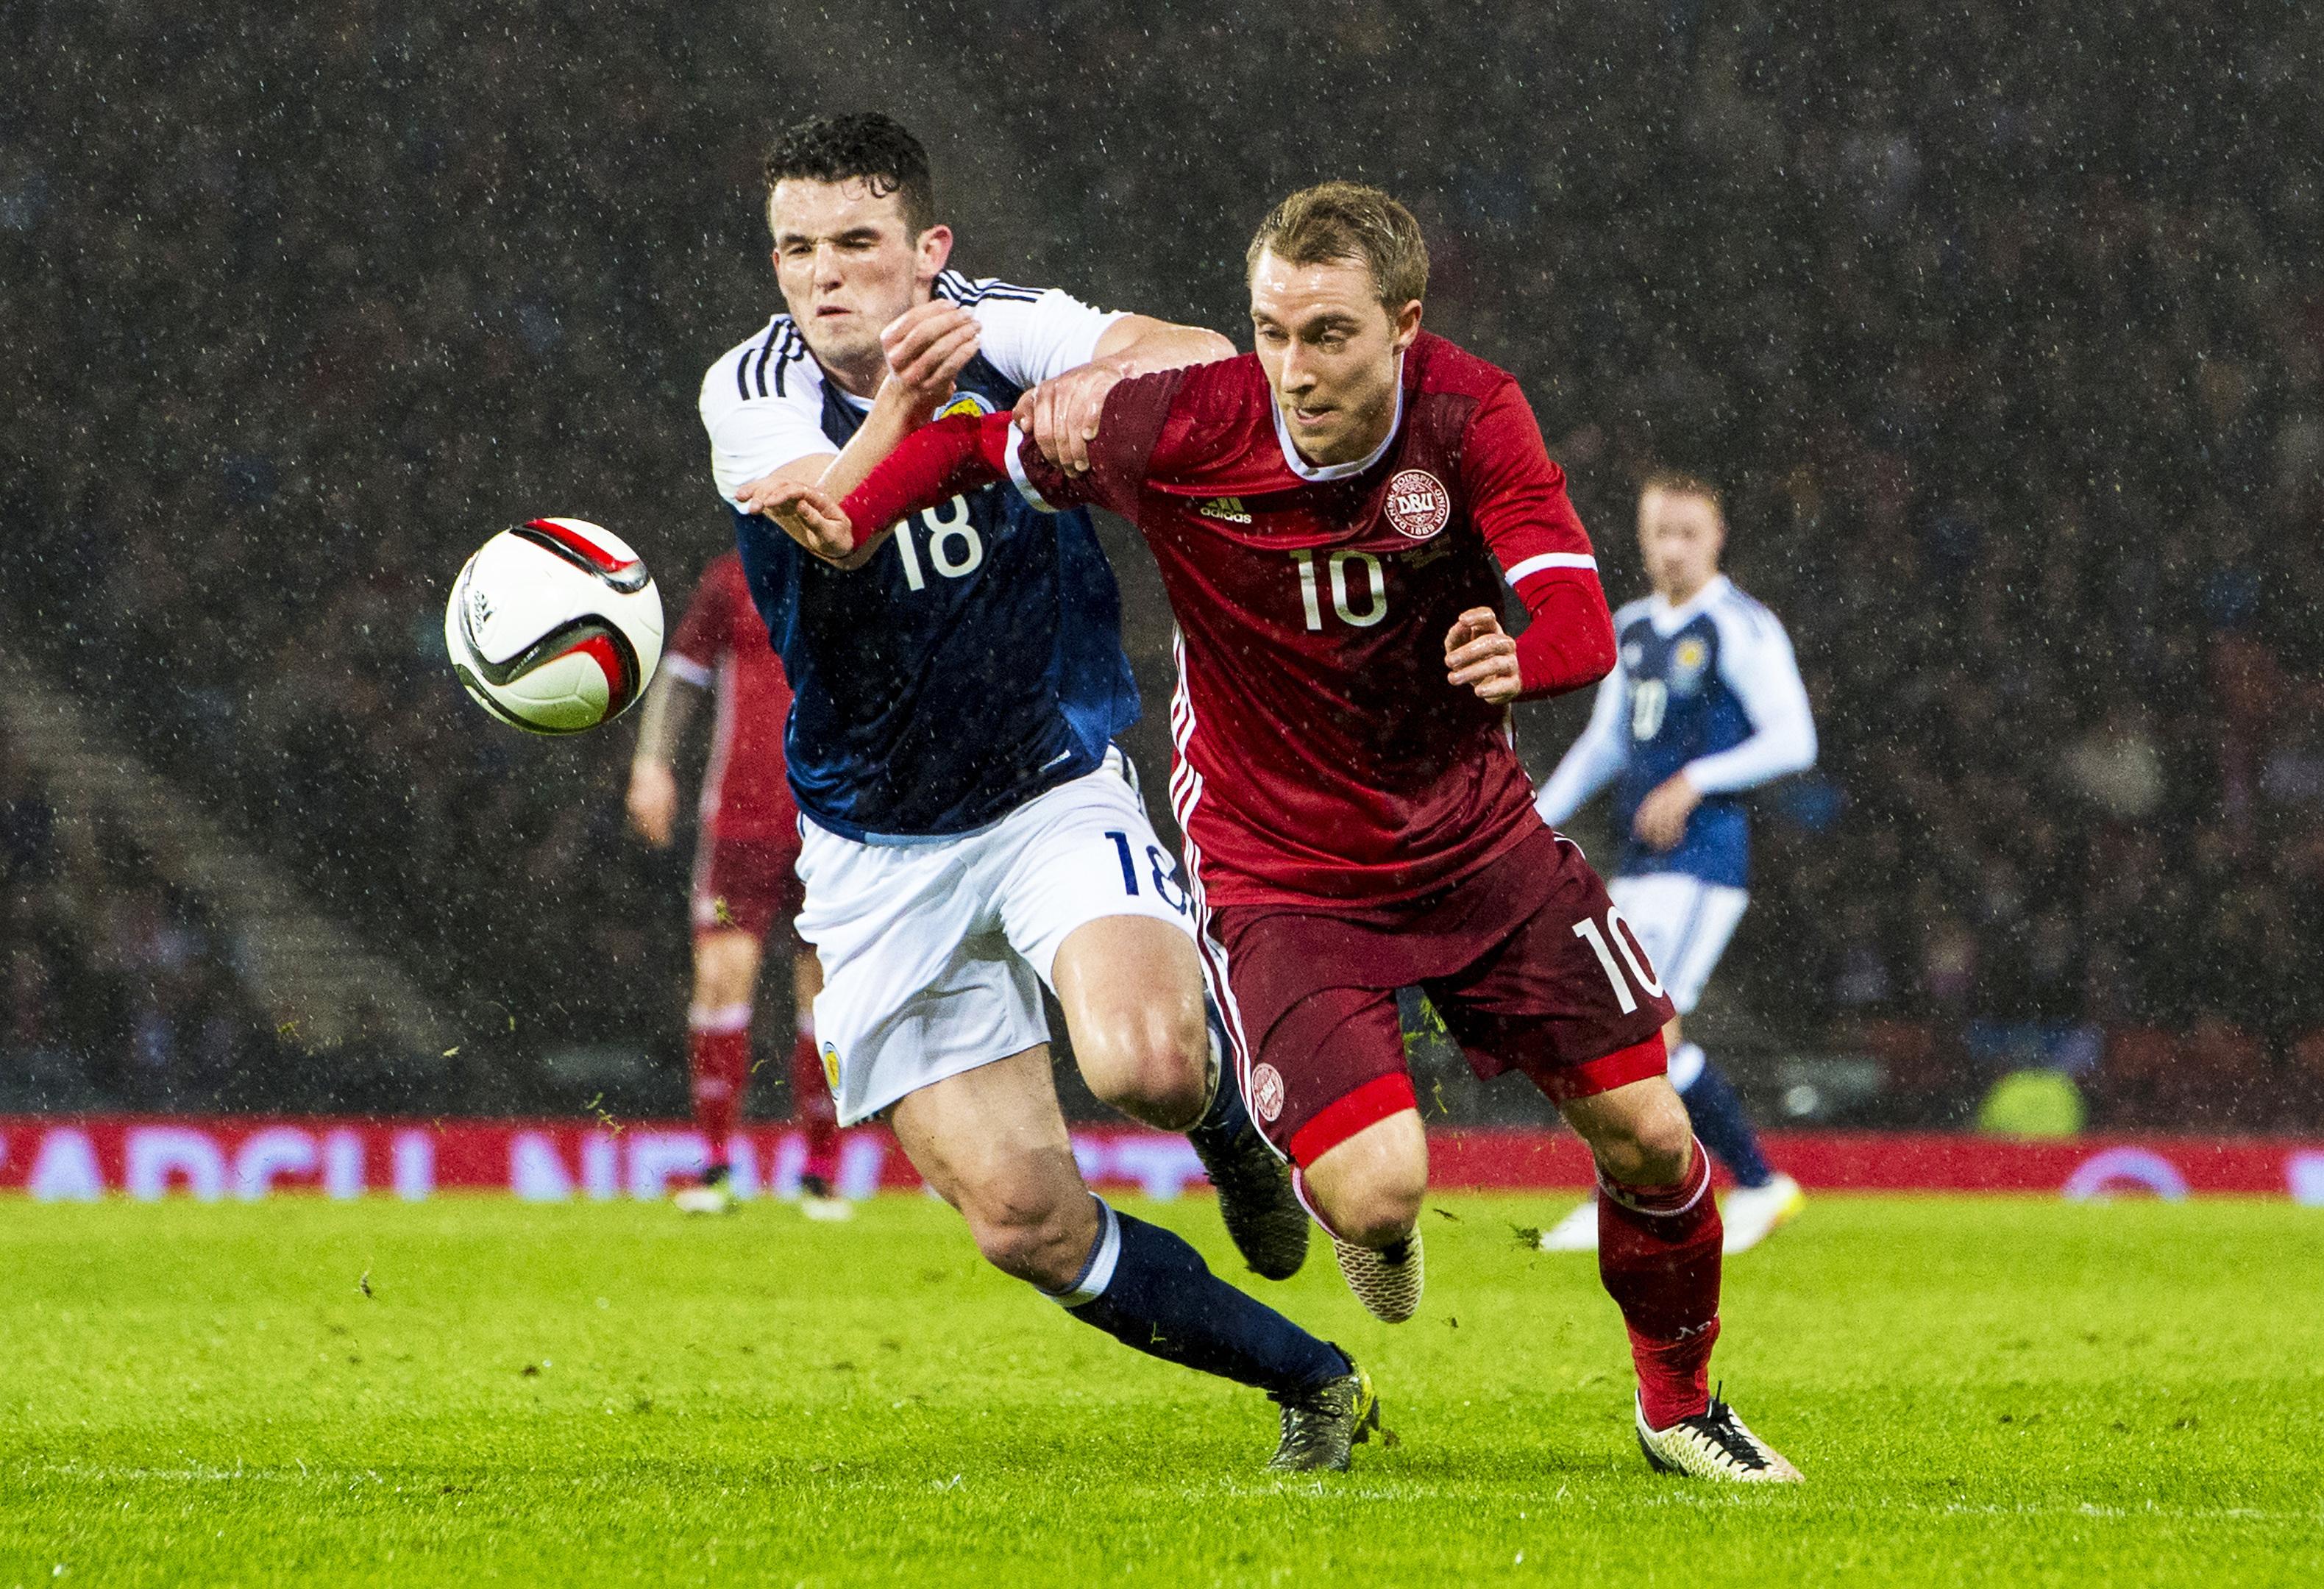 Denmark star Christian Eriksen and Scotland's John McGinn in action during a 2016 friendly, which Scotland won 1-0.